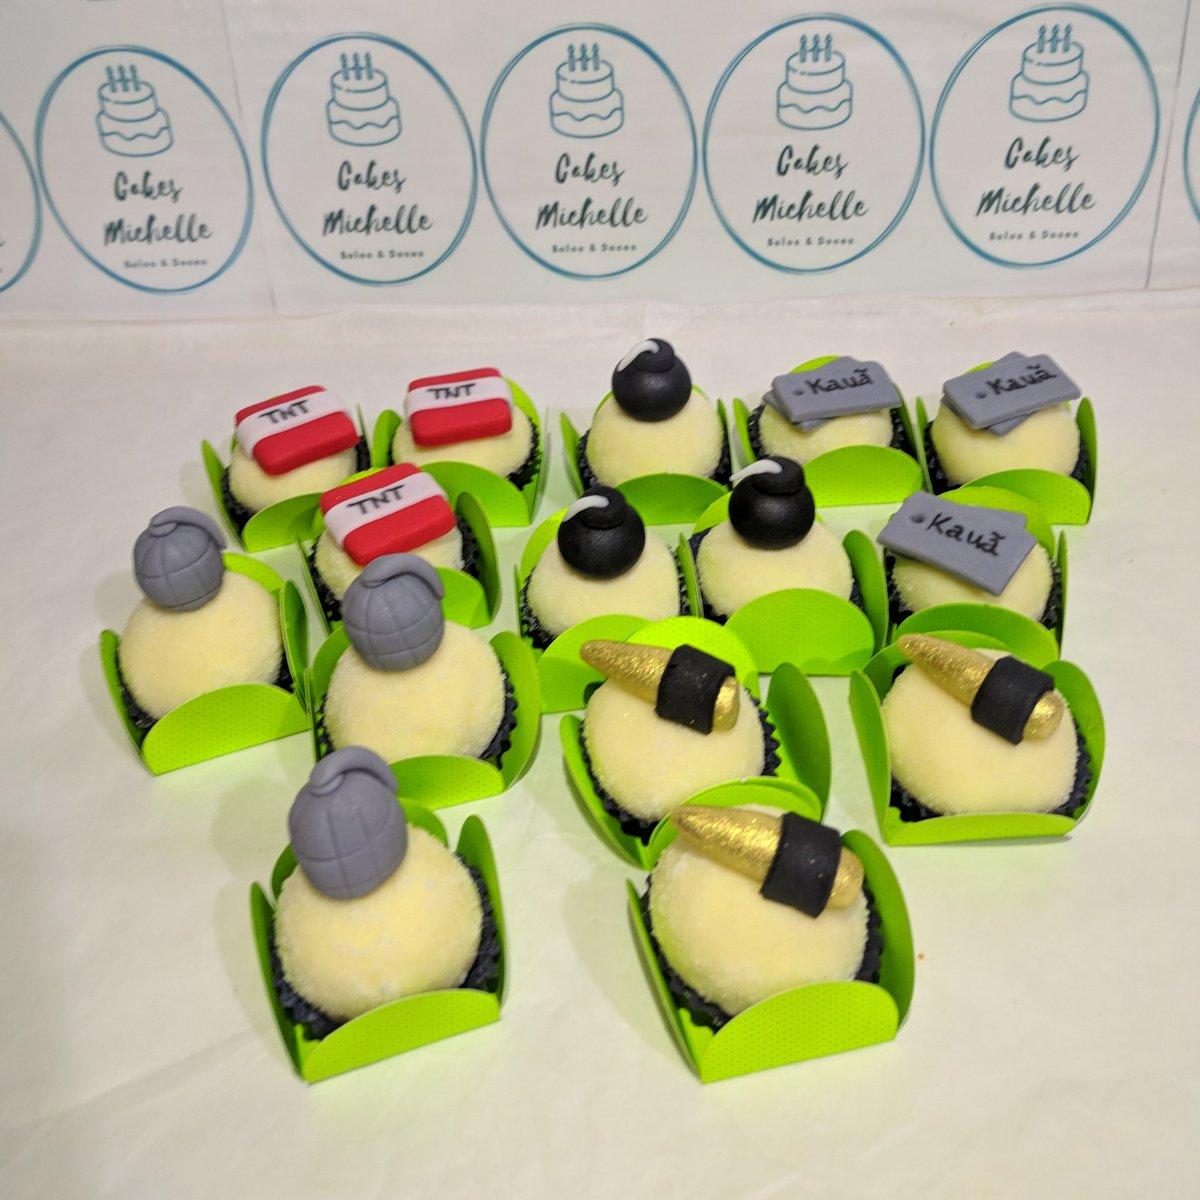 Doces personalizados com tema Free Fire 🎂🍰 #cakes #cakesmichelle #pastaamericana  #trufasdecoradas #docinhospersonalizados #festatematica #docesdecorados #sweet #loveconfeitaria #festafreefire